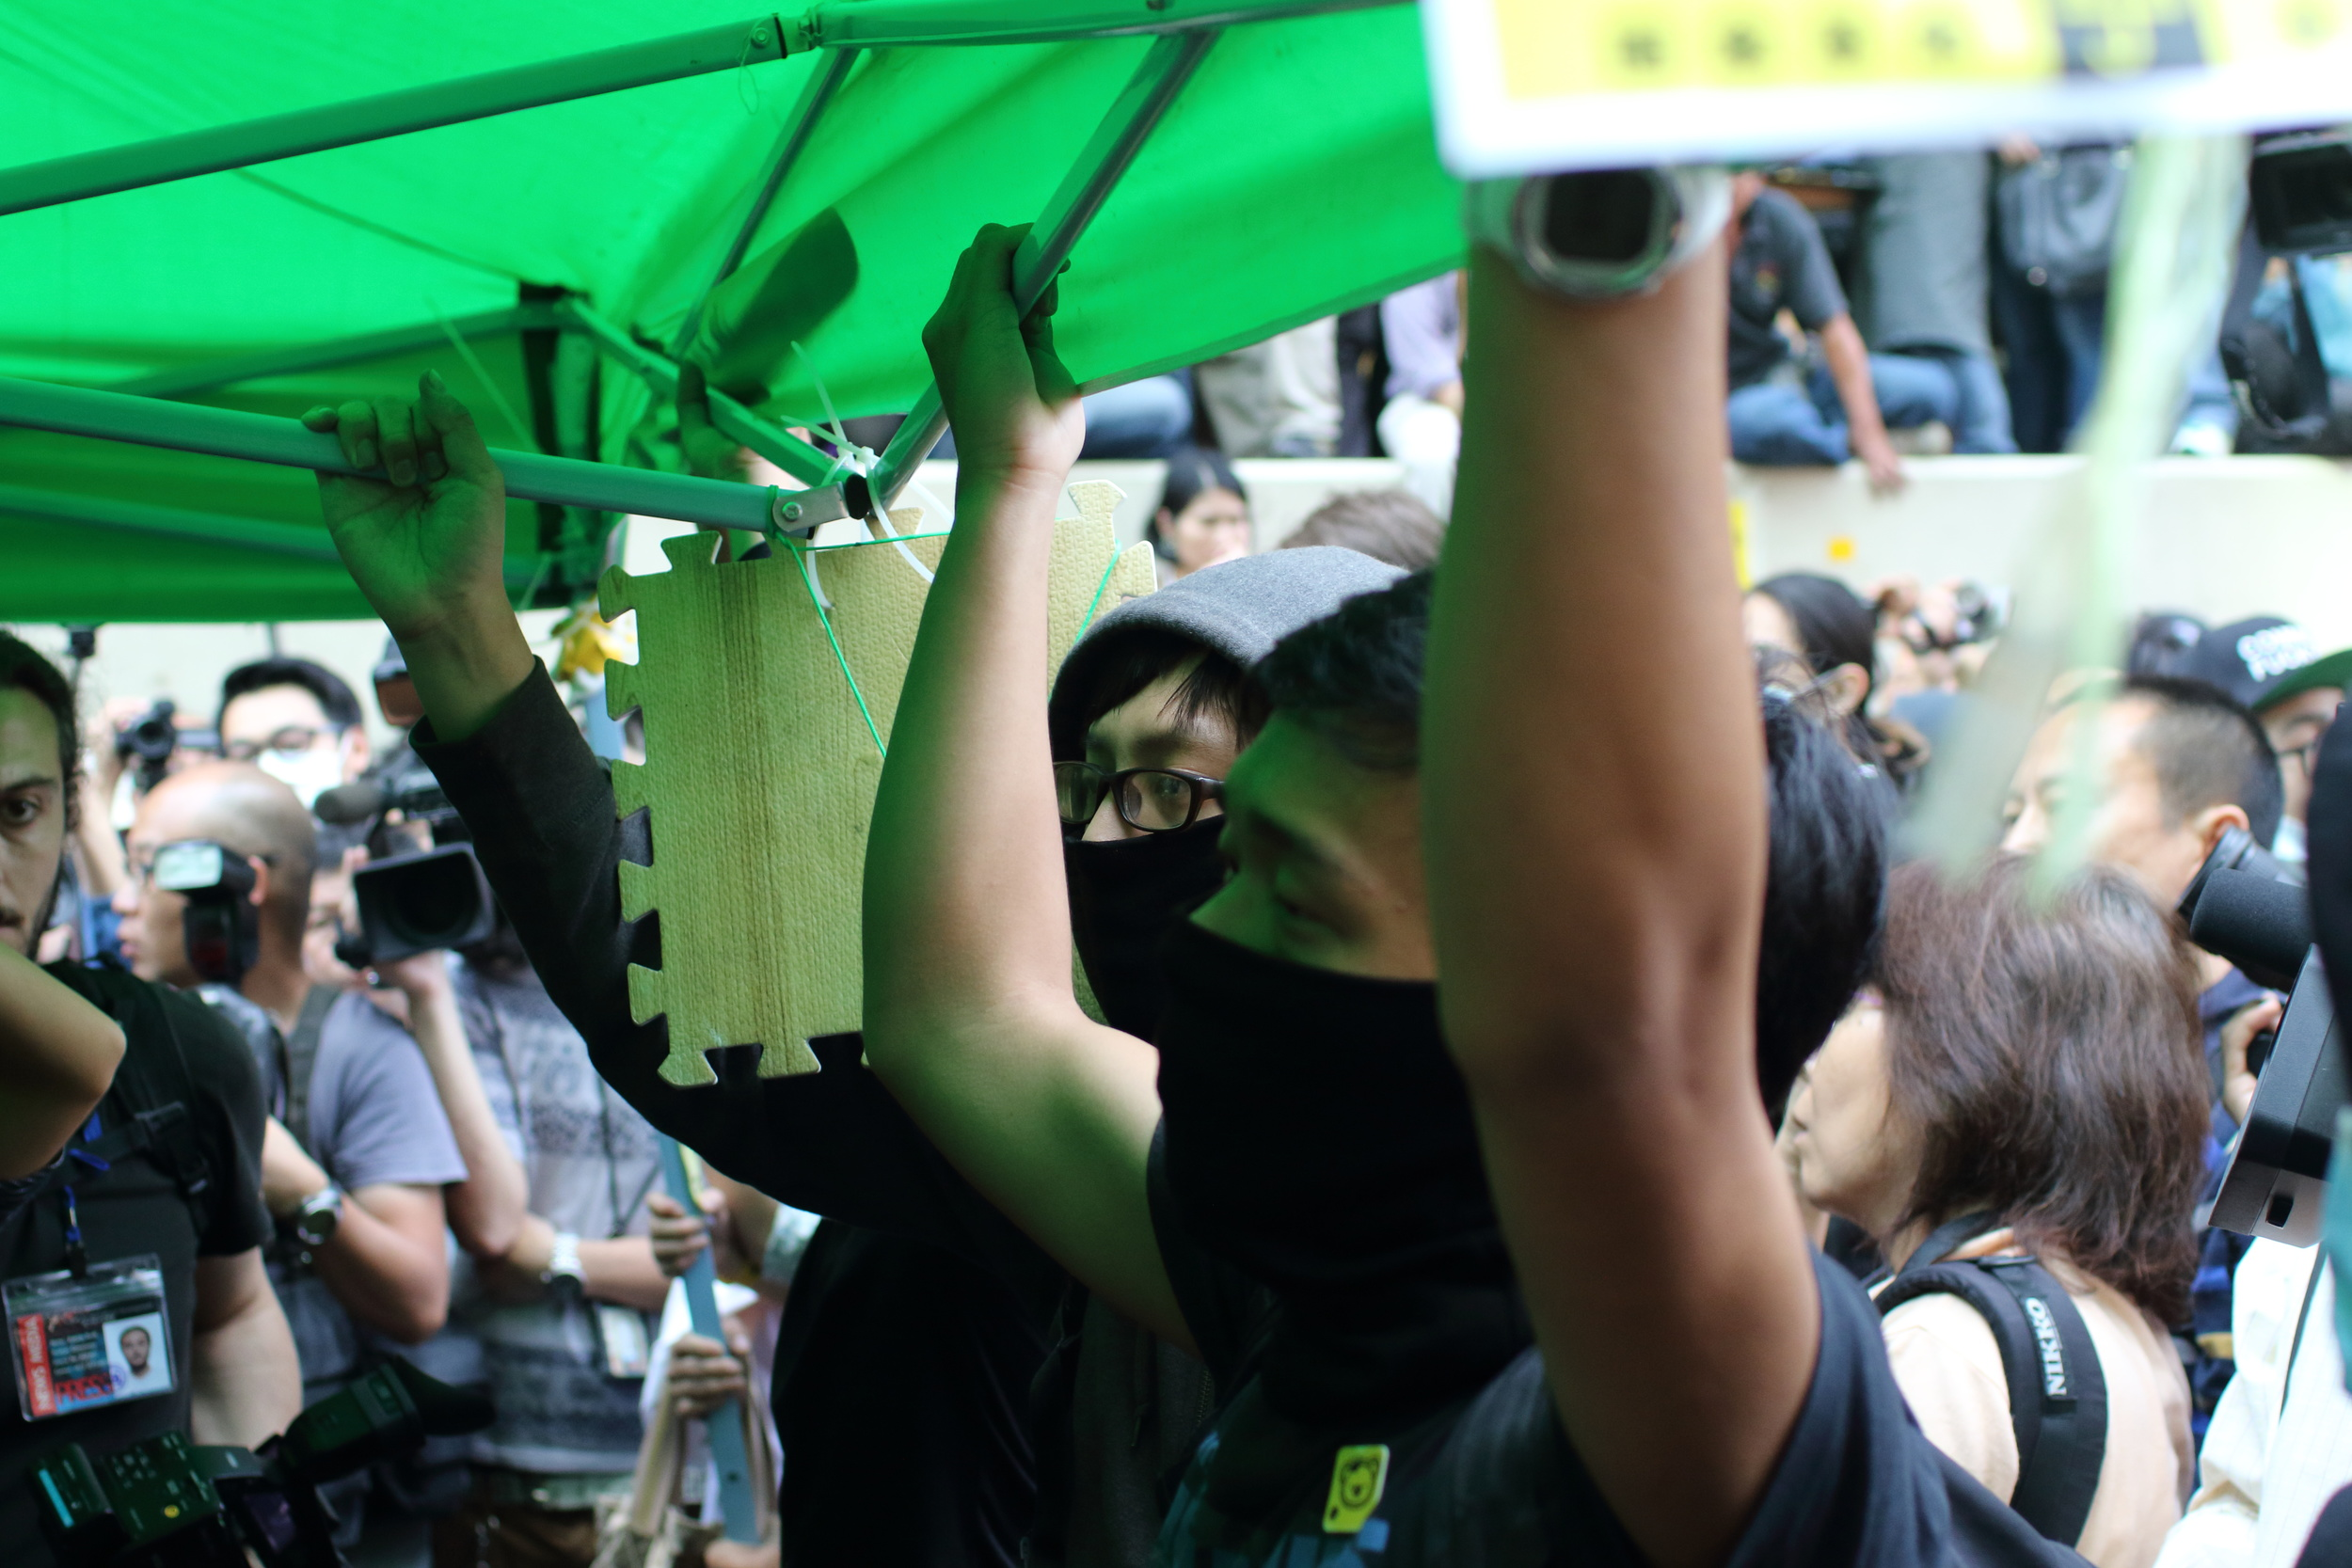 jfung1 Mongkok Argyle Clearance24.JPG